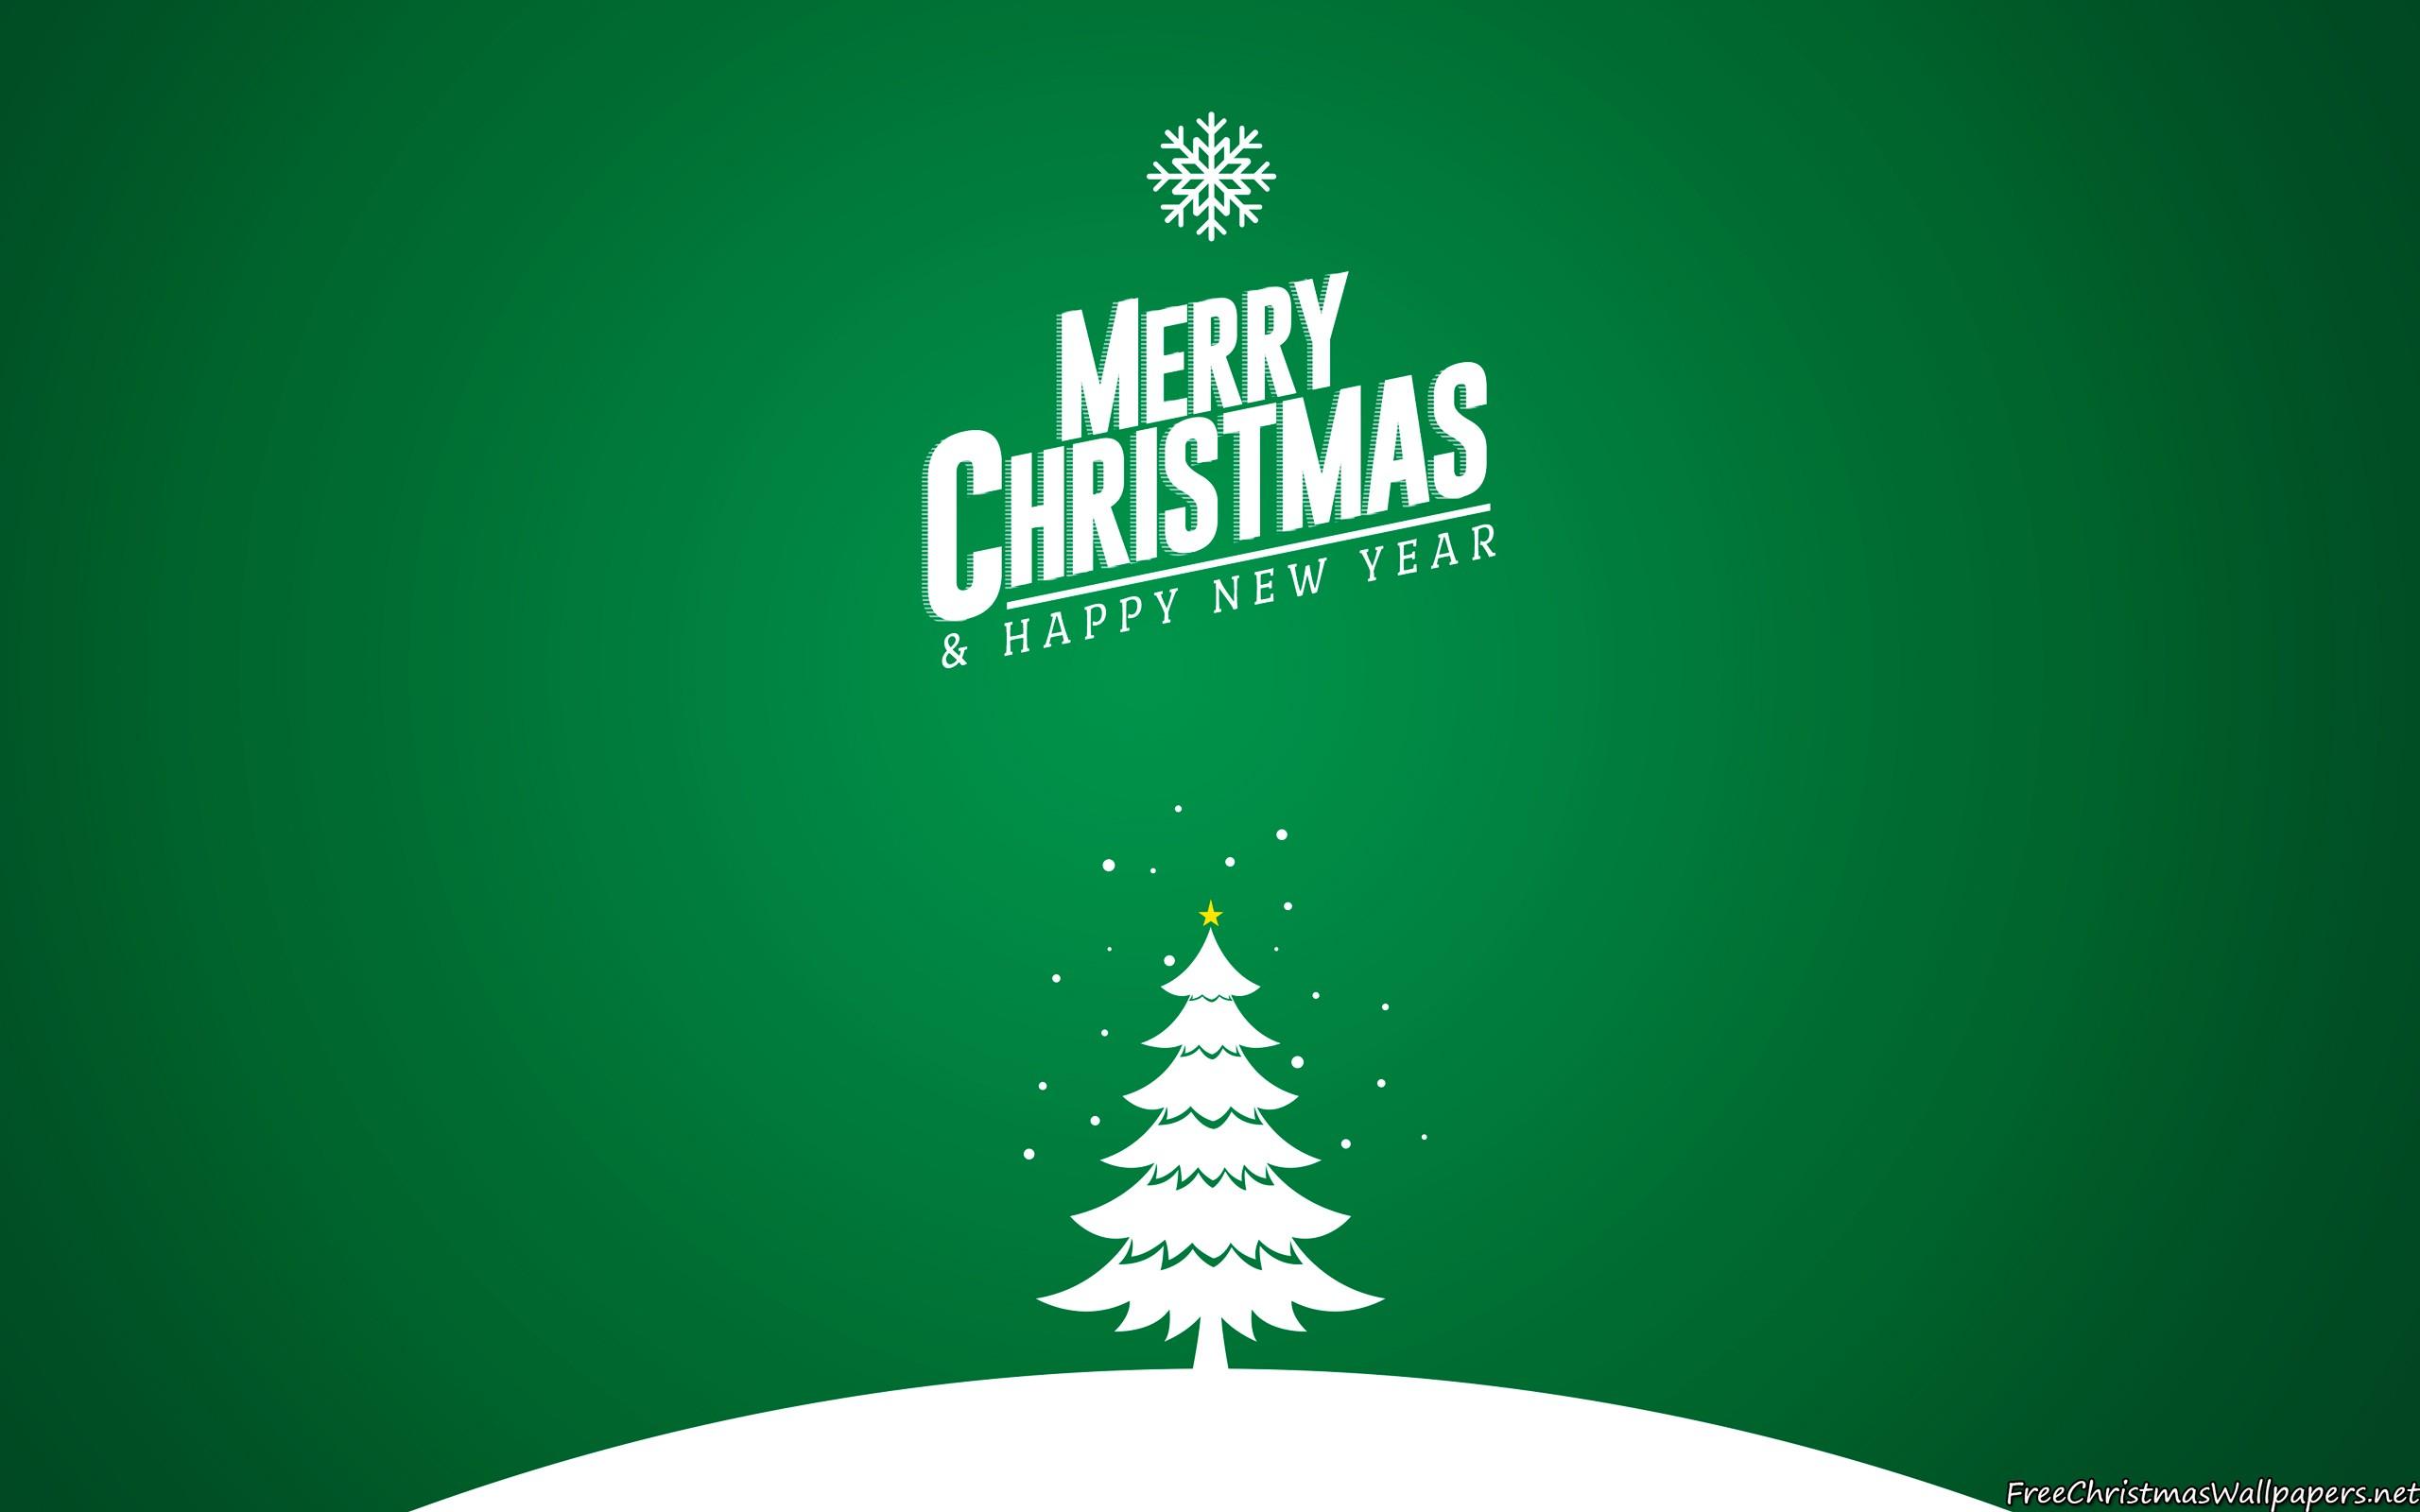 Merry Christmas Tree Card 1 2560x1600 Wallpaper